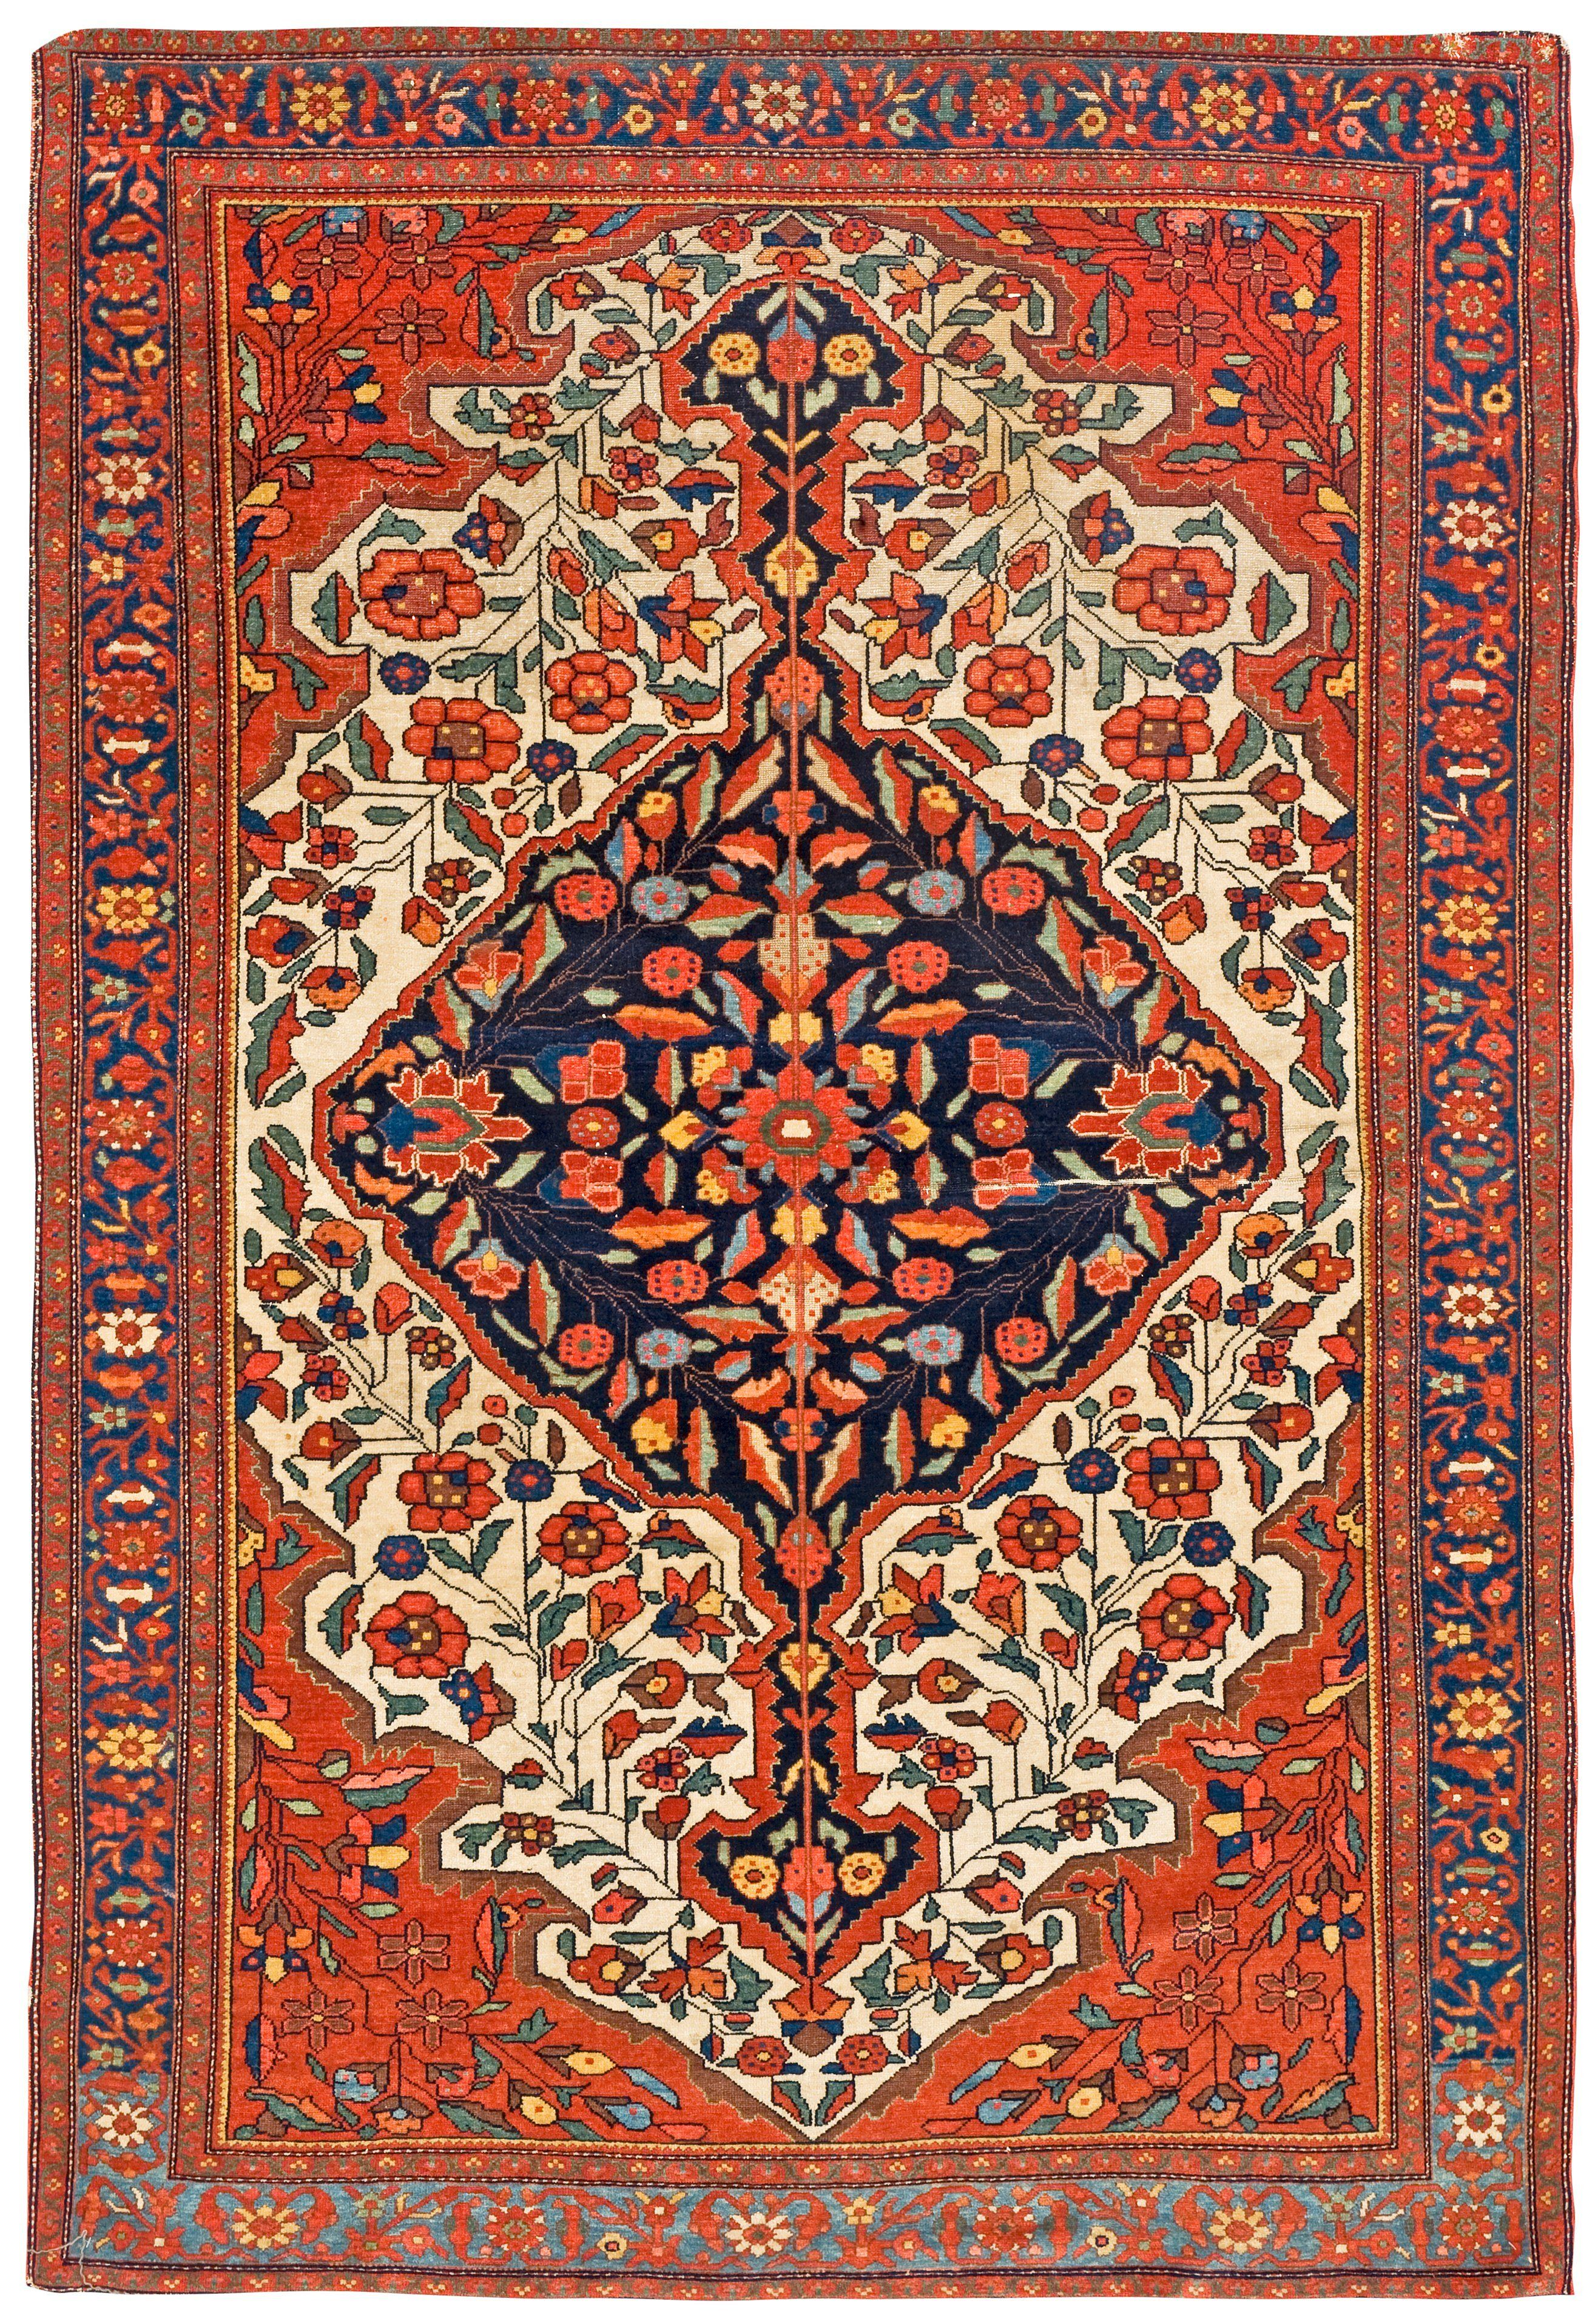 Persian Fereghan Sarouk Rug In 2019 Iranian Rugs Rugs